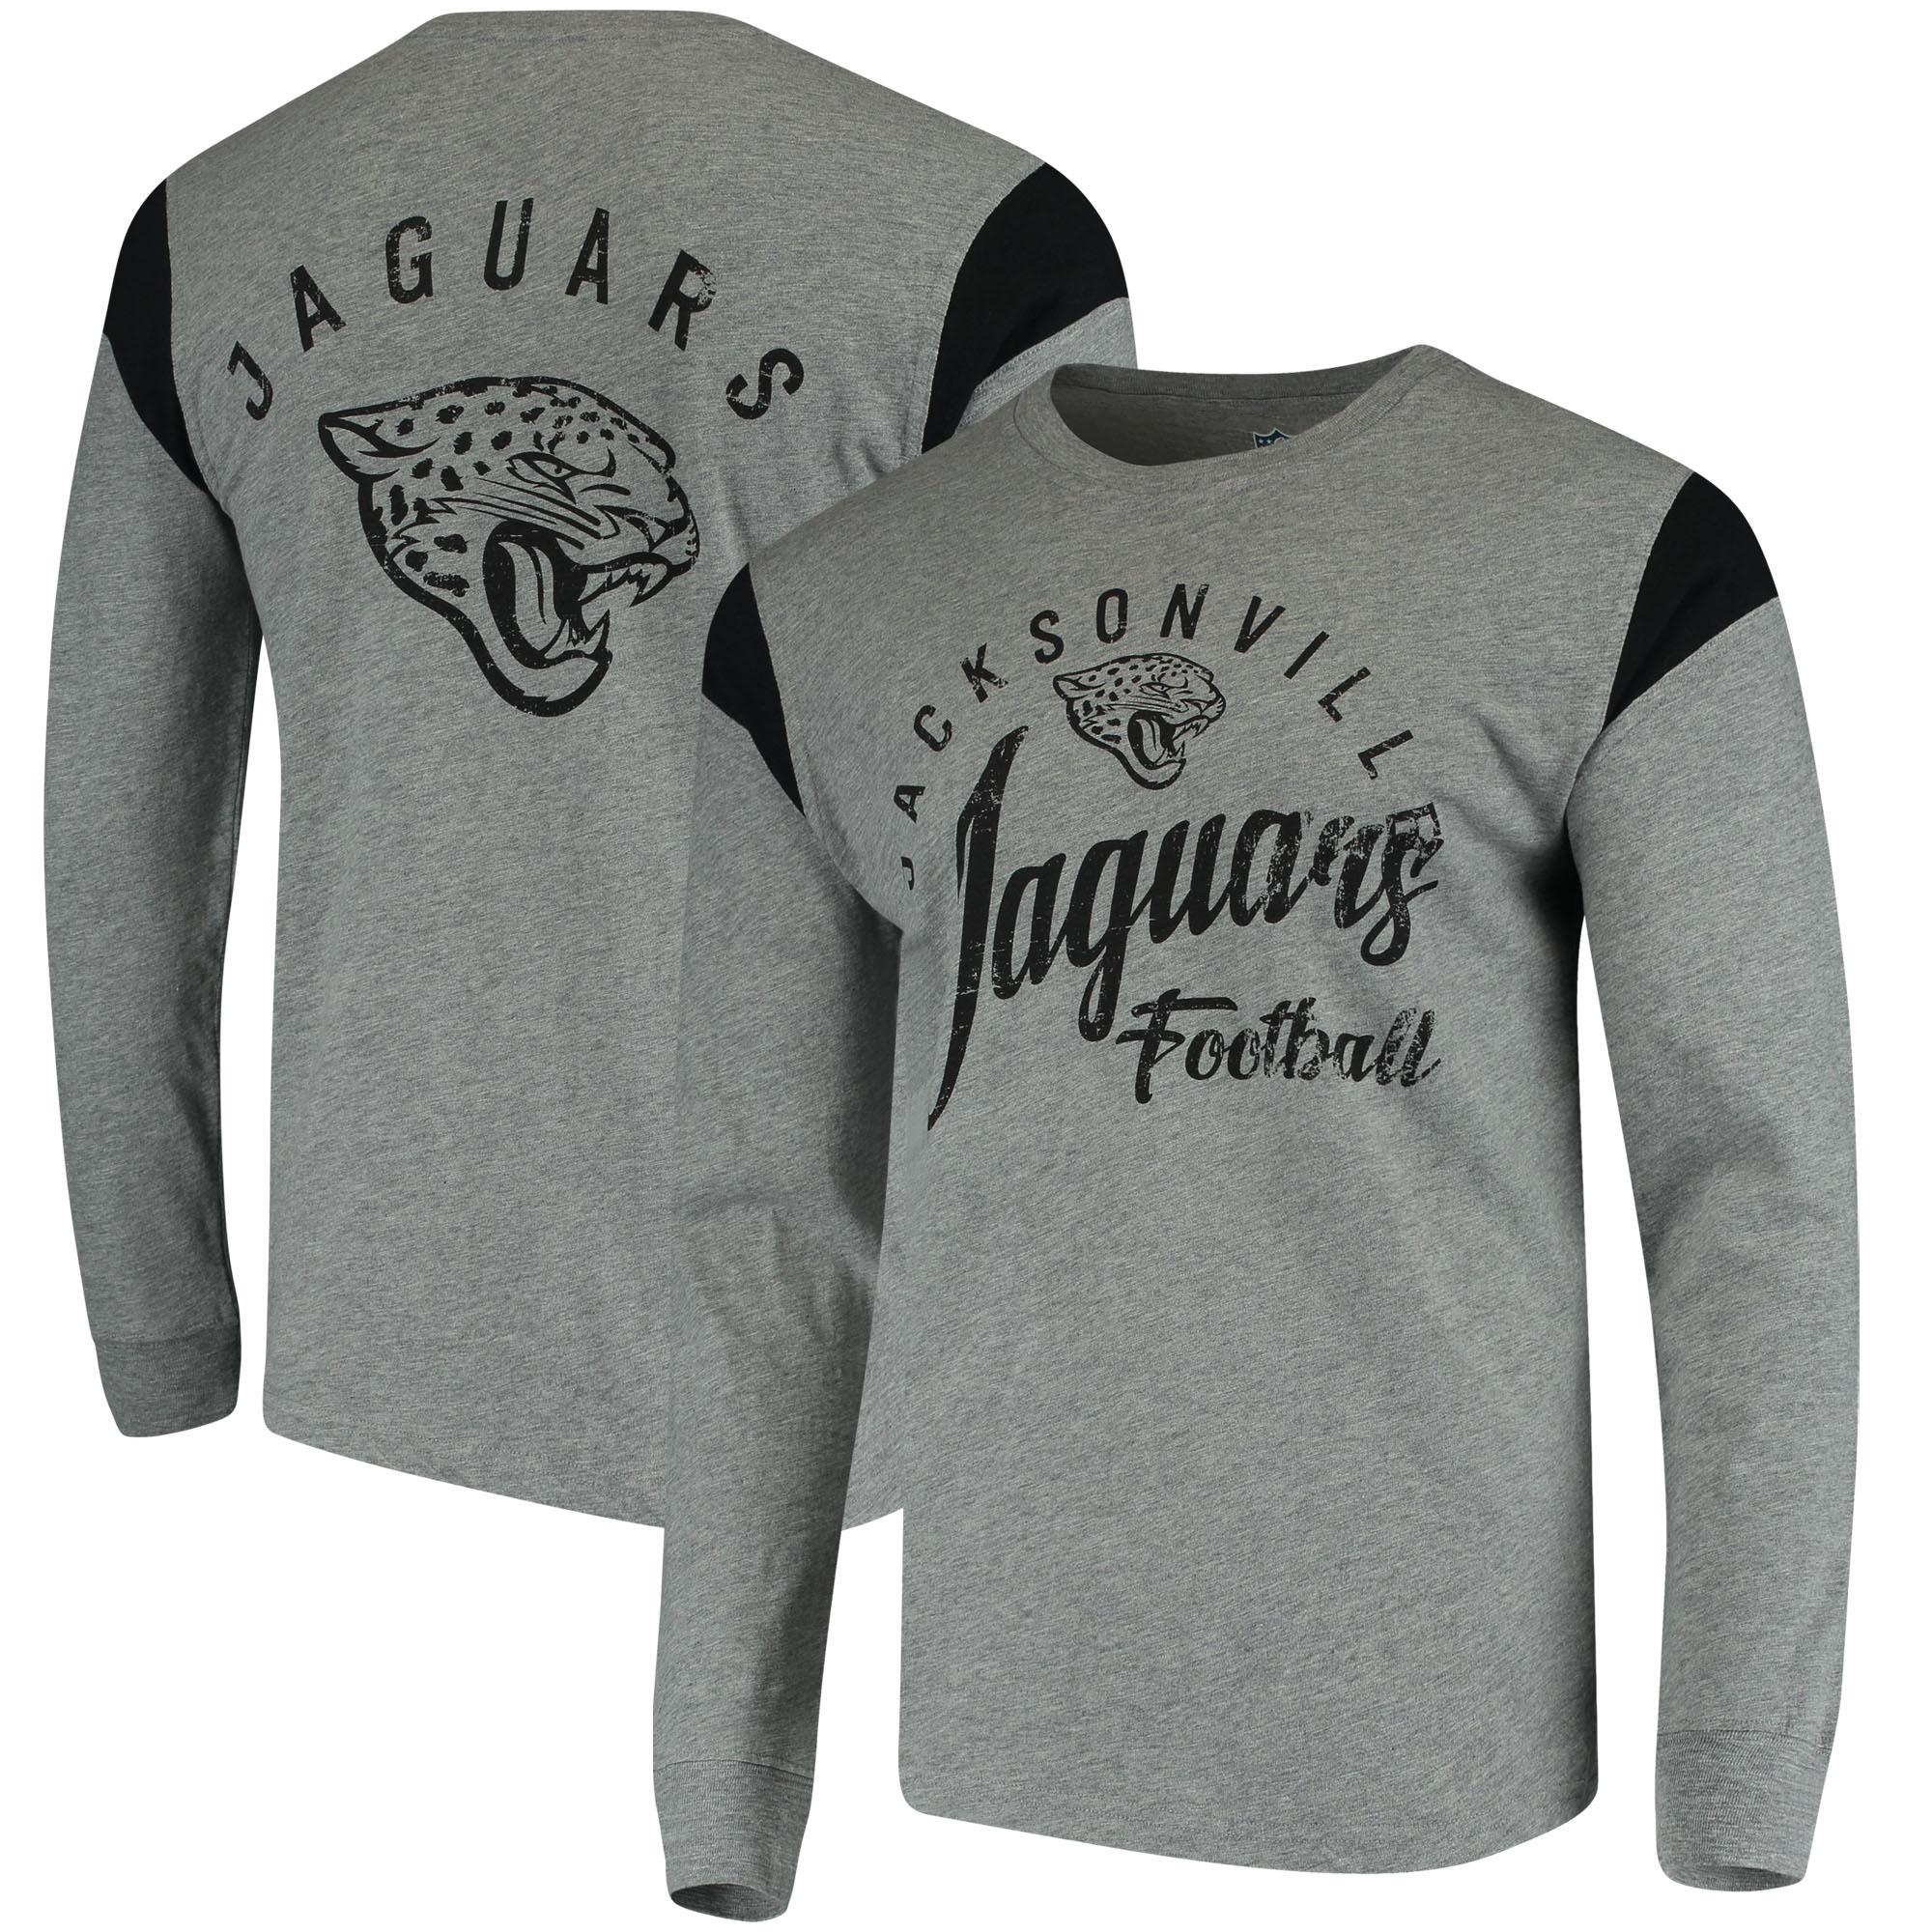 Jacksonville Jaguars Hands High Receiver Long Sleeve T-Shirt - Gray/Black